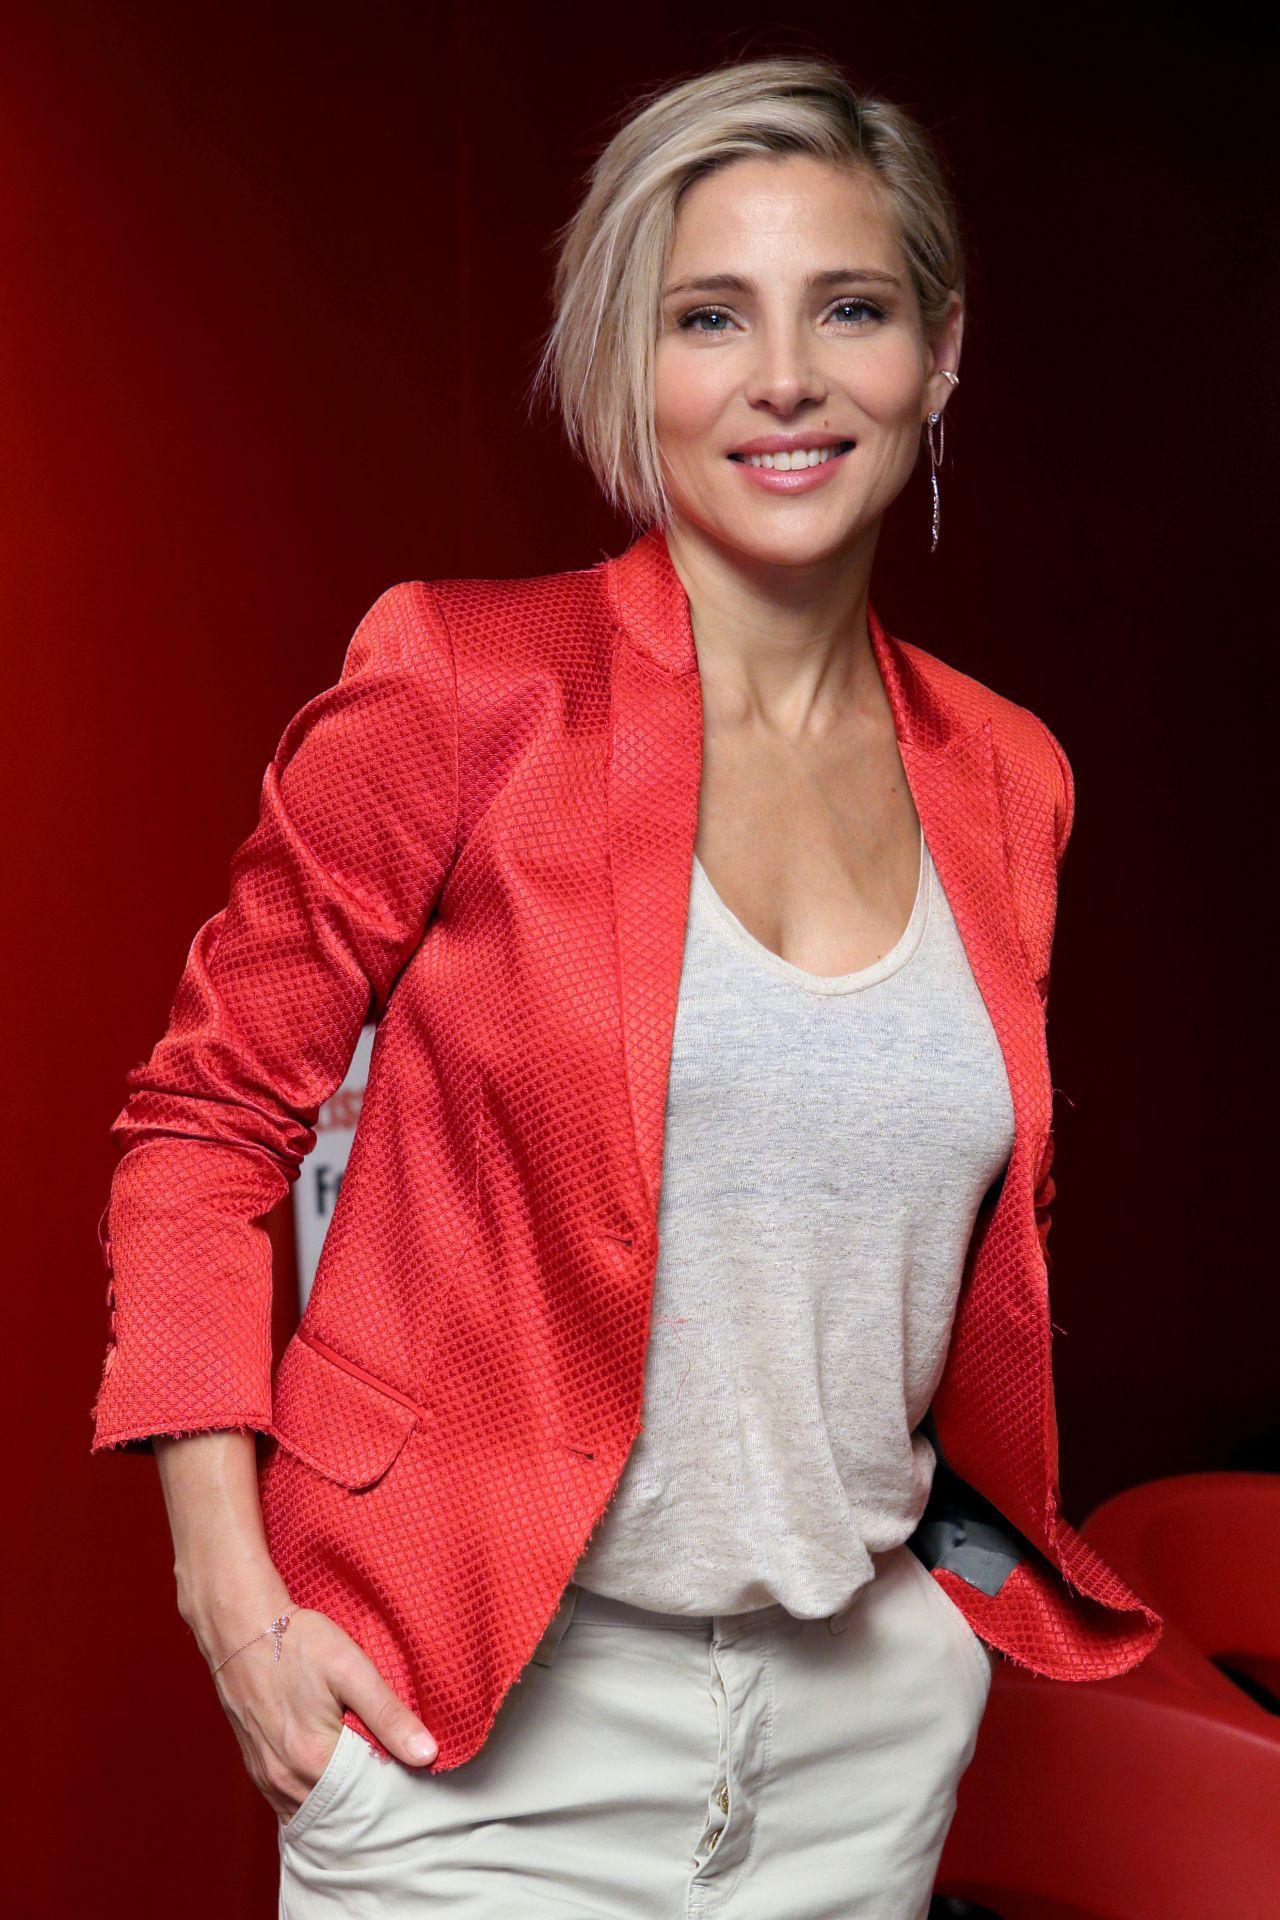 Elsa Pataky Hairstyle ELSA PATAKY